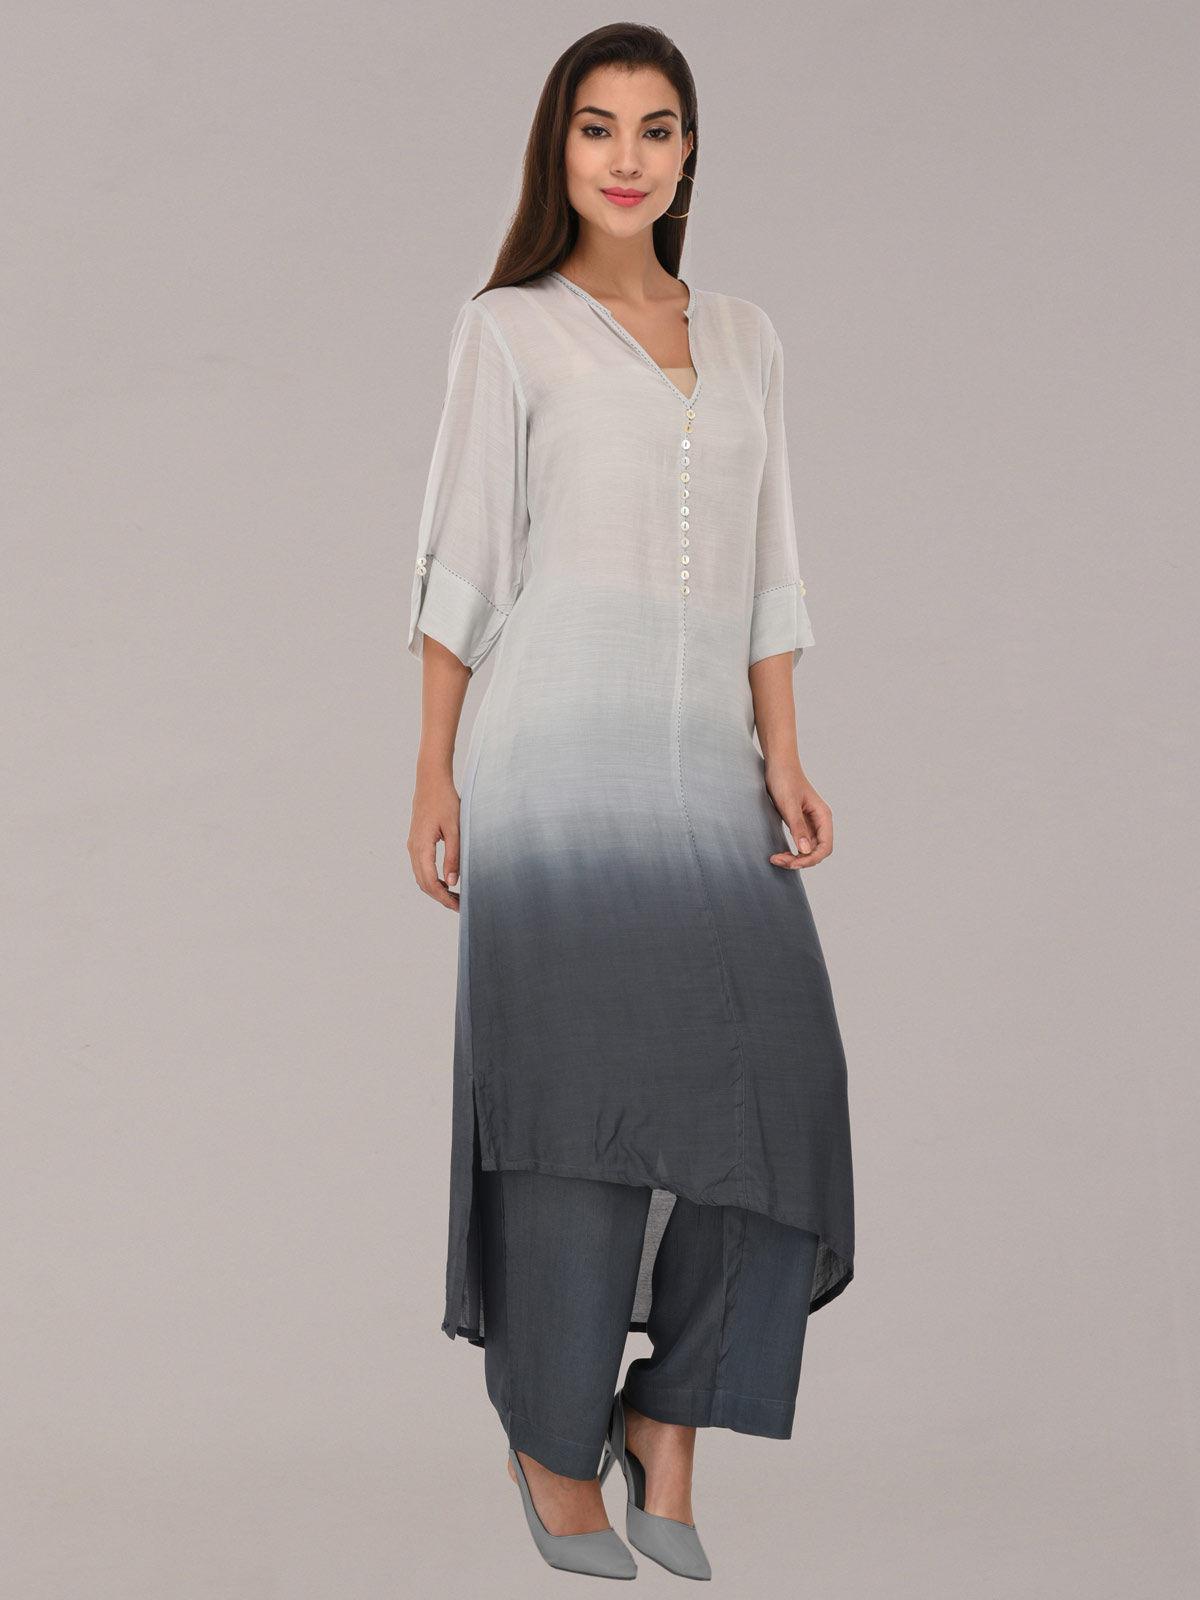 Modal ombre light & dark grey tunic with bottom